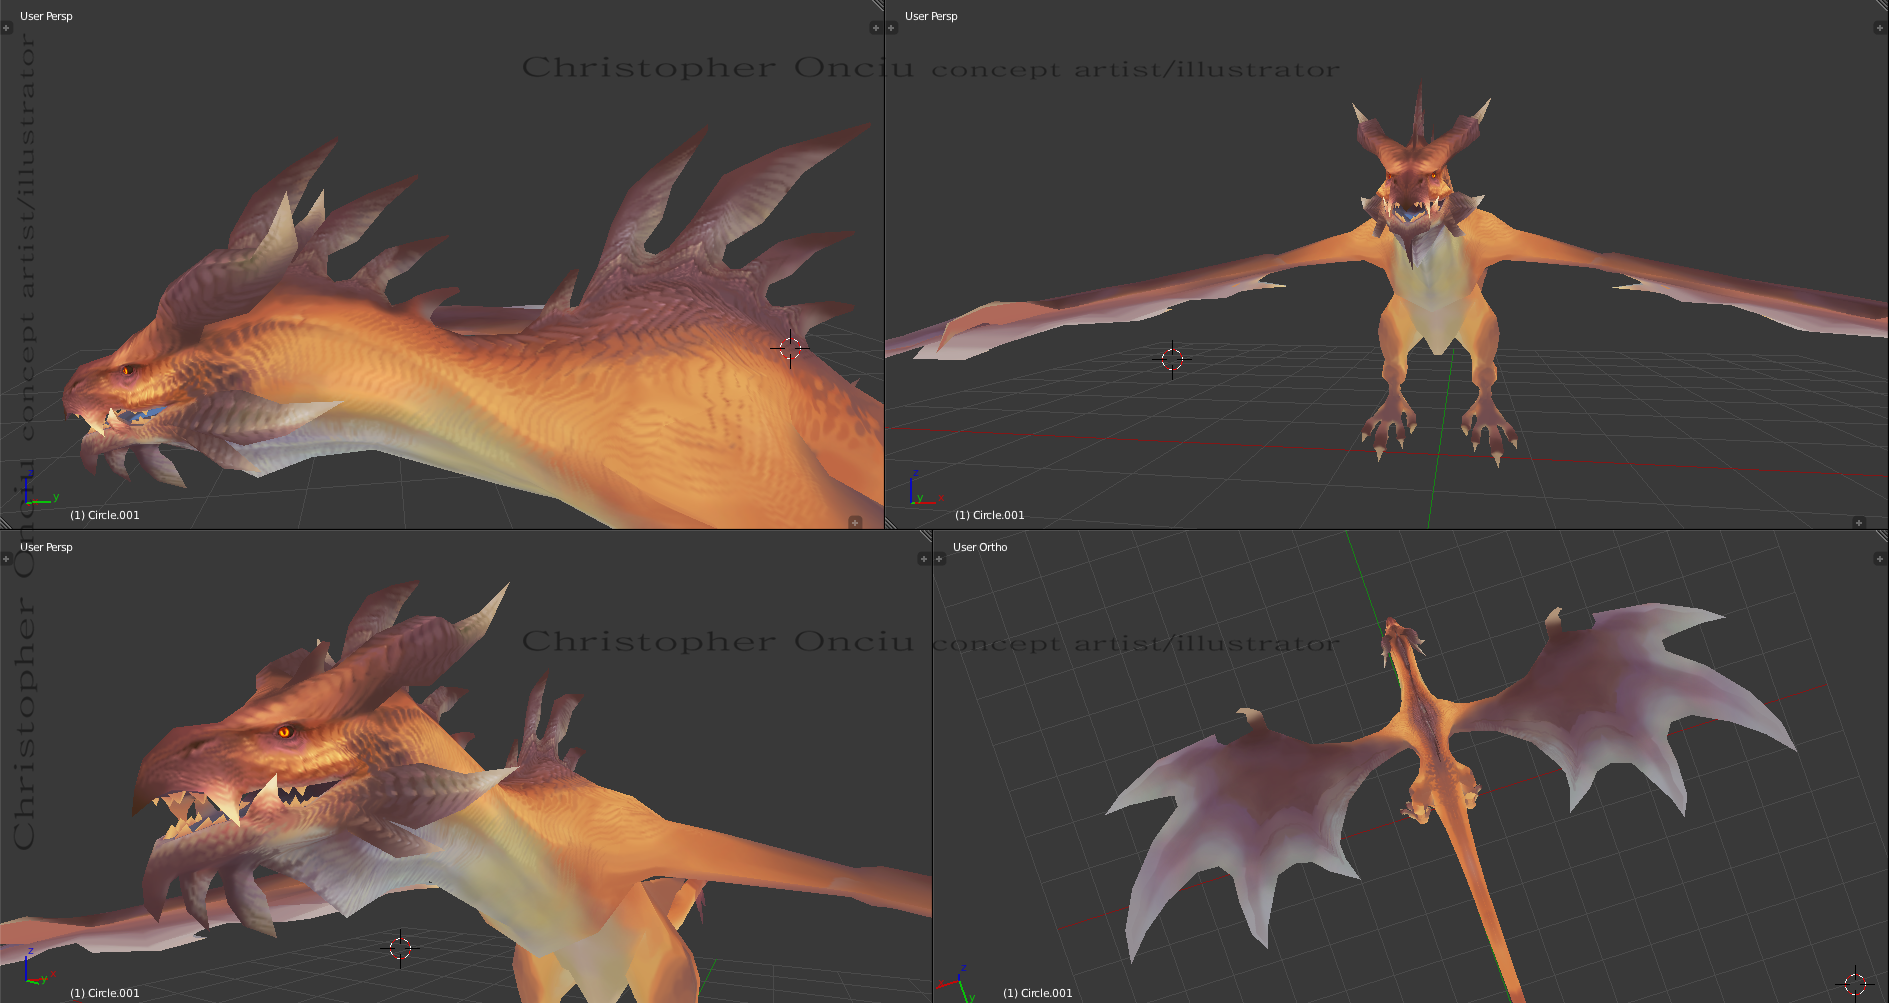 Wyvern - texture phase [WIP2] by ChristopherOnciu